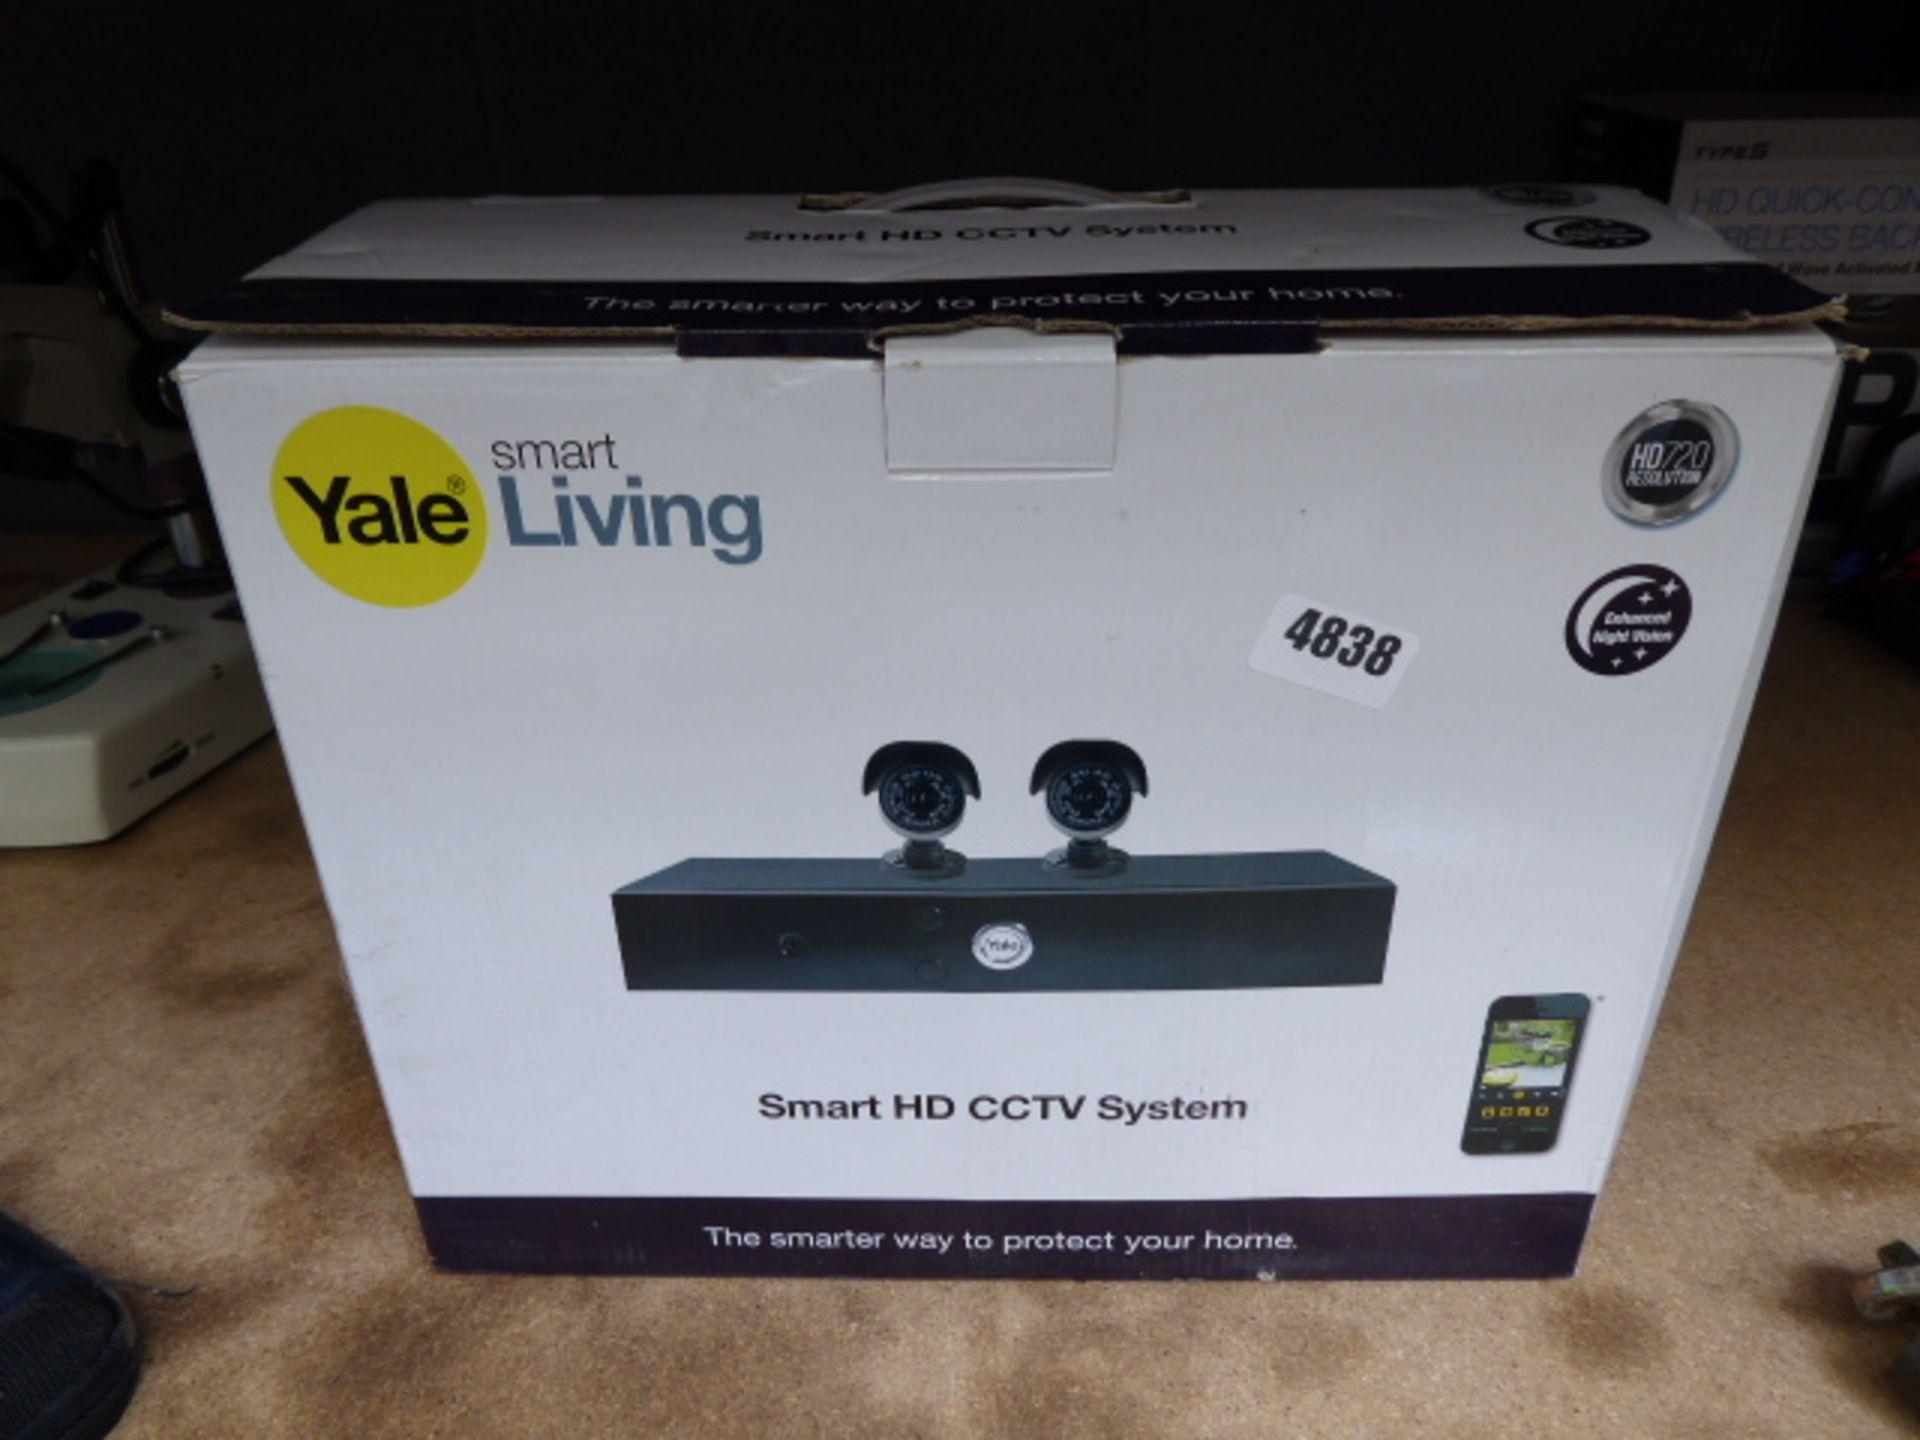 Lot 4838 - Yale smart living CCTV system